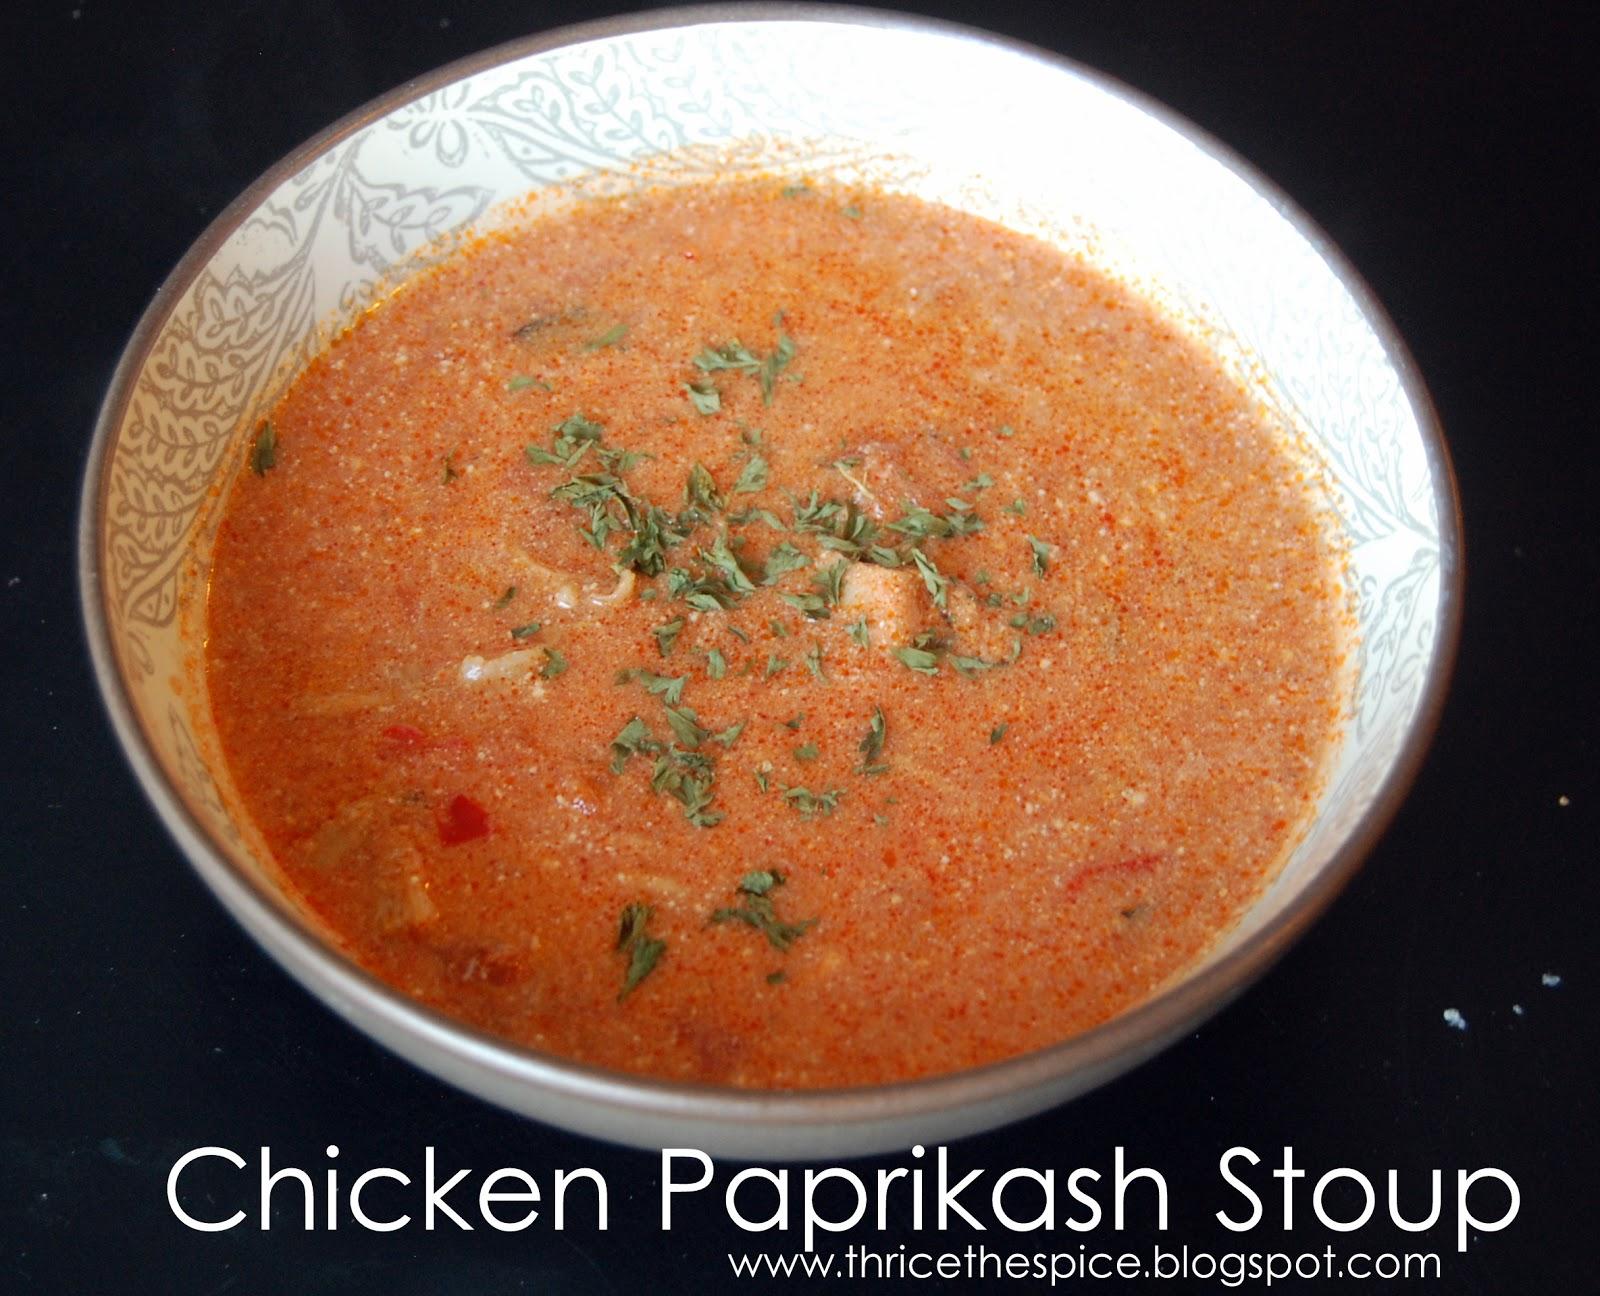 Paprikash Soup Chicken Chicken Paprikash Stoup